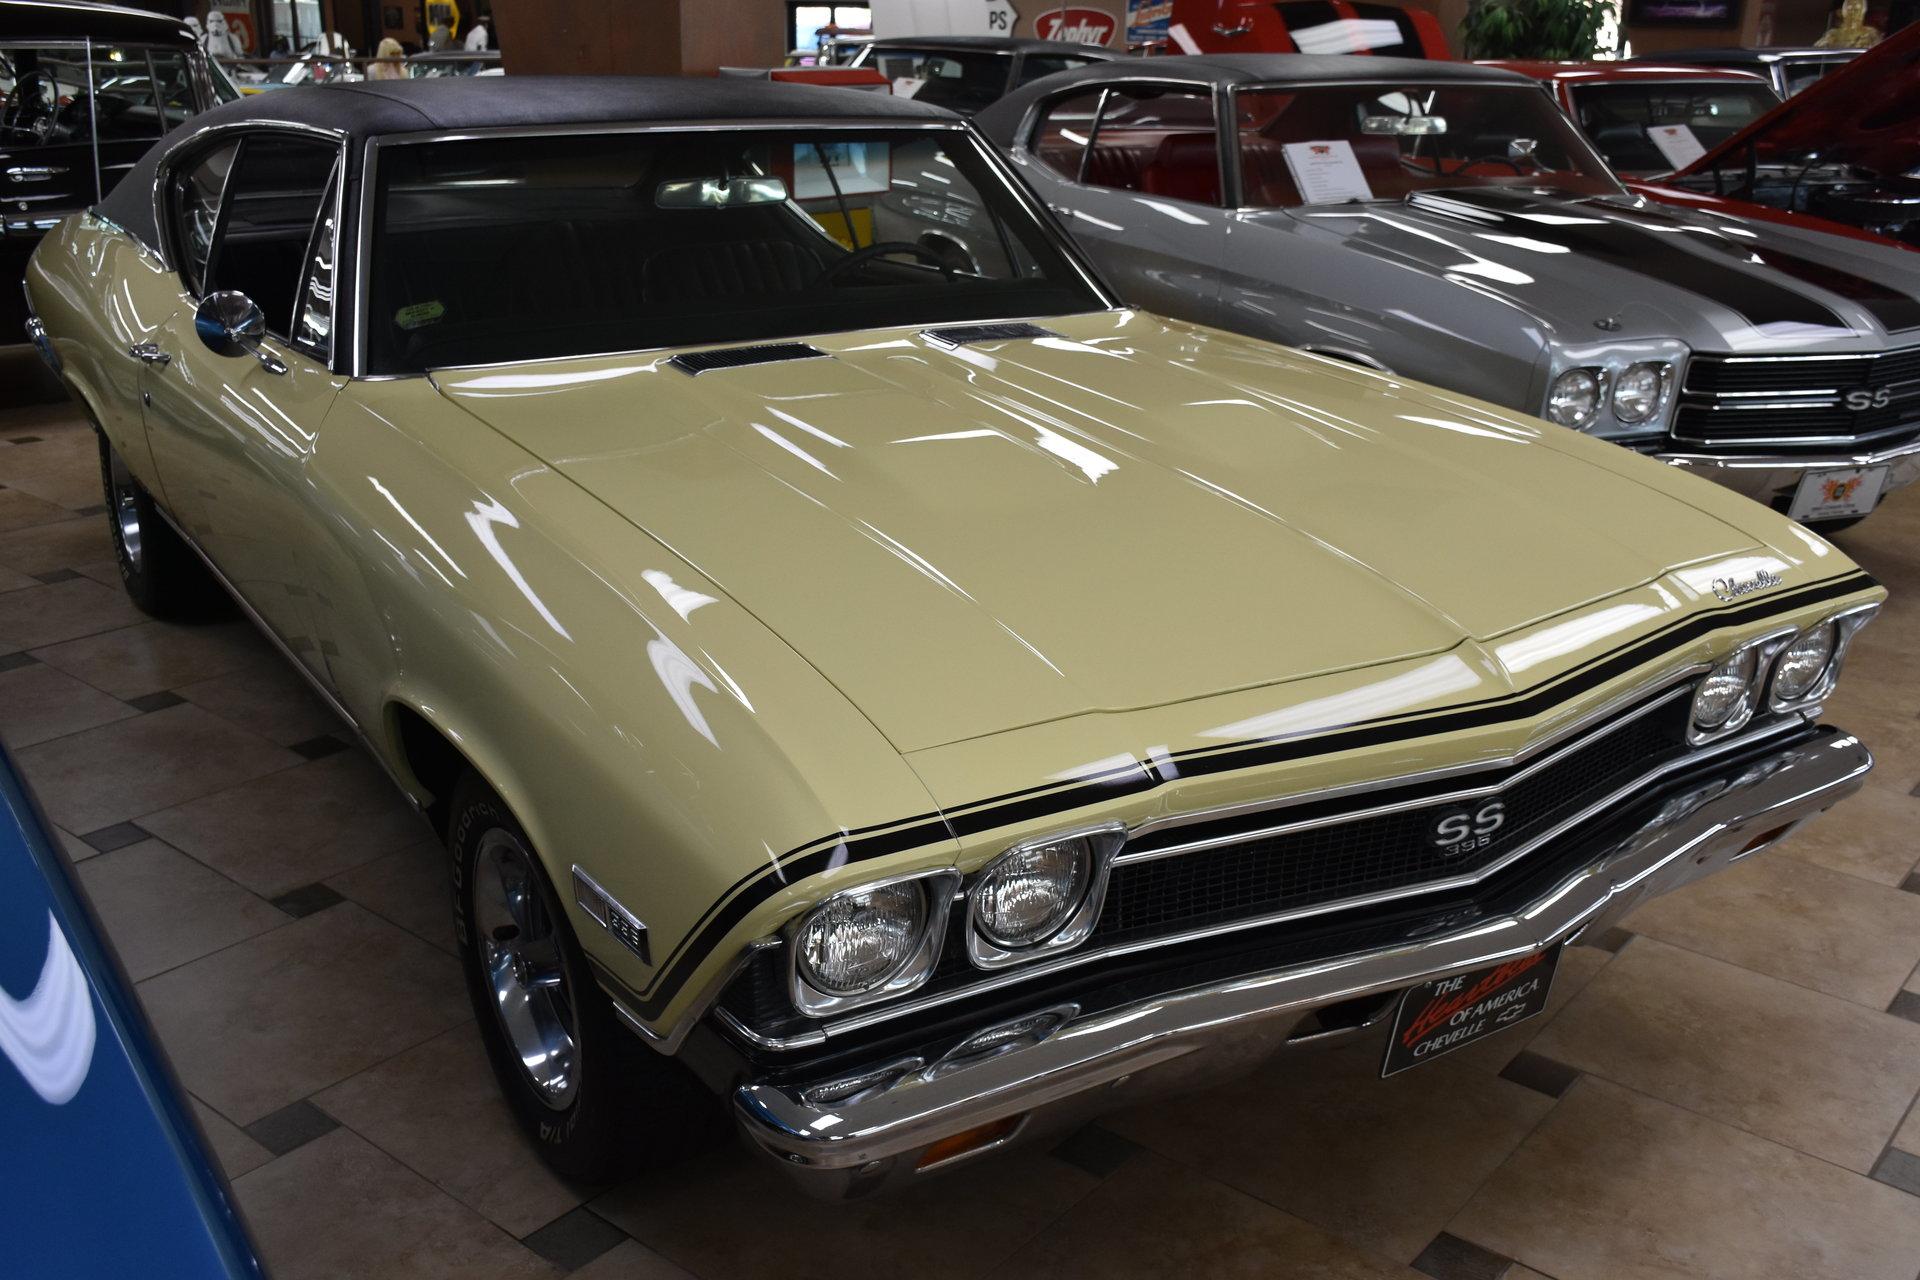 1968 Chevrolet Chevelle Ideal Classic Cars Llc